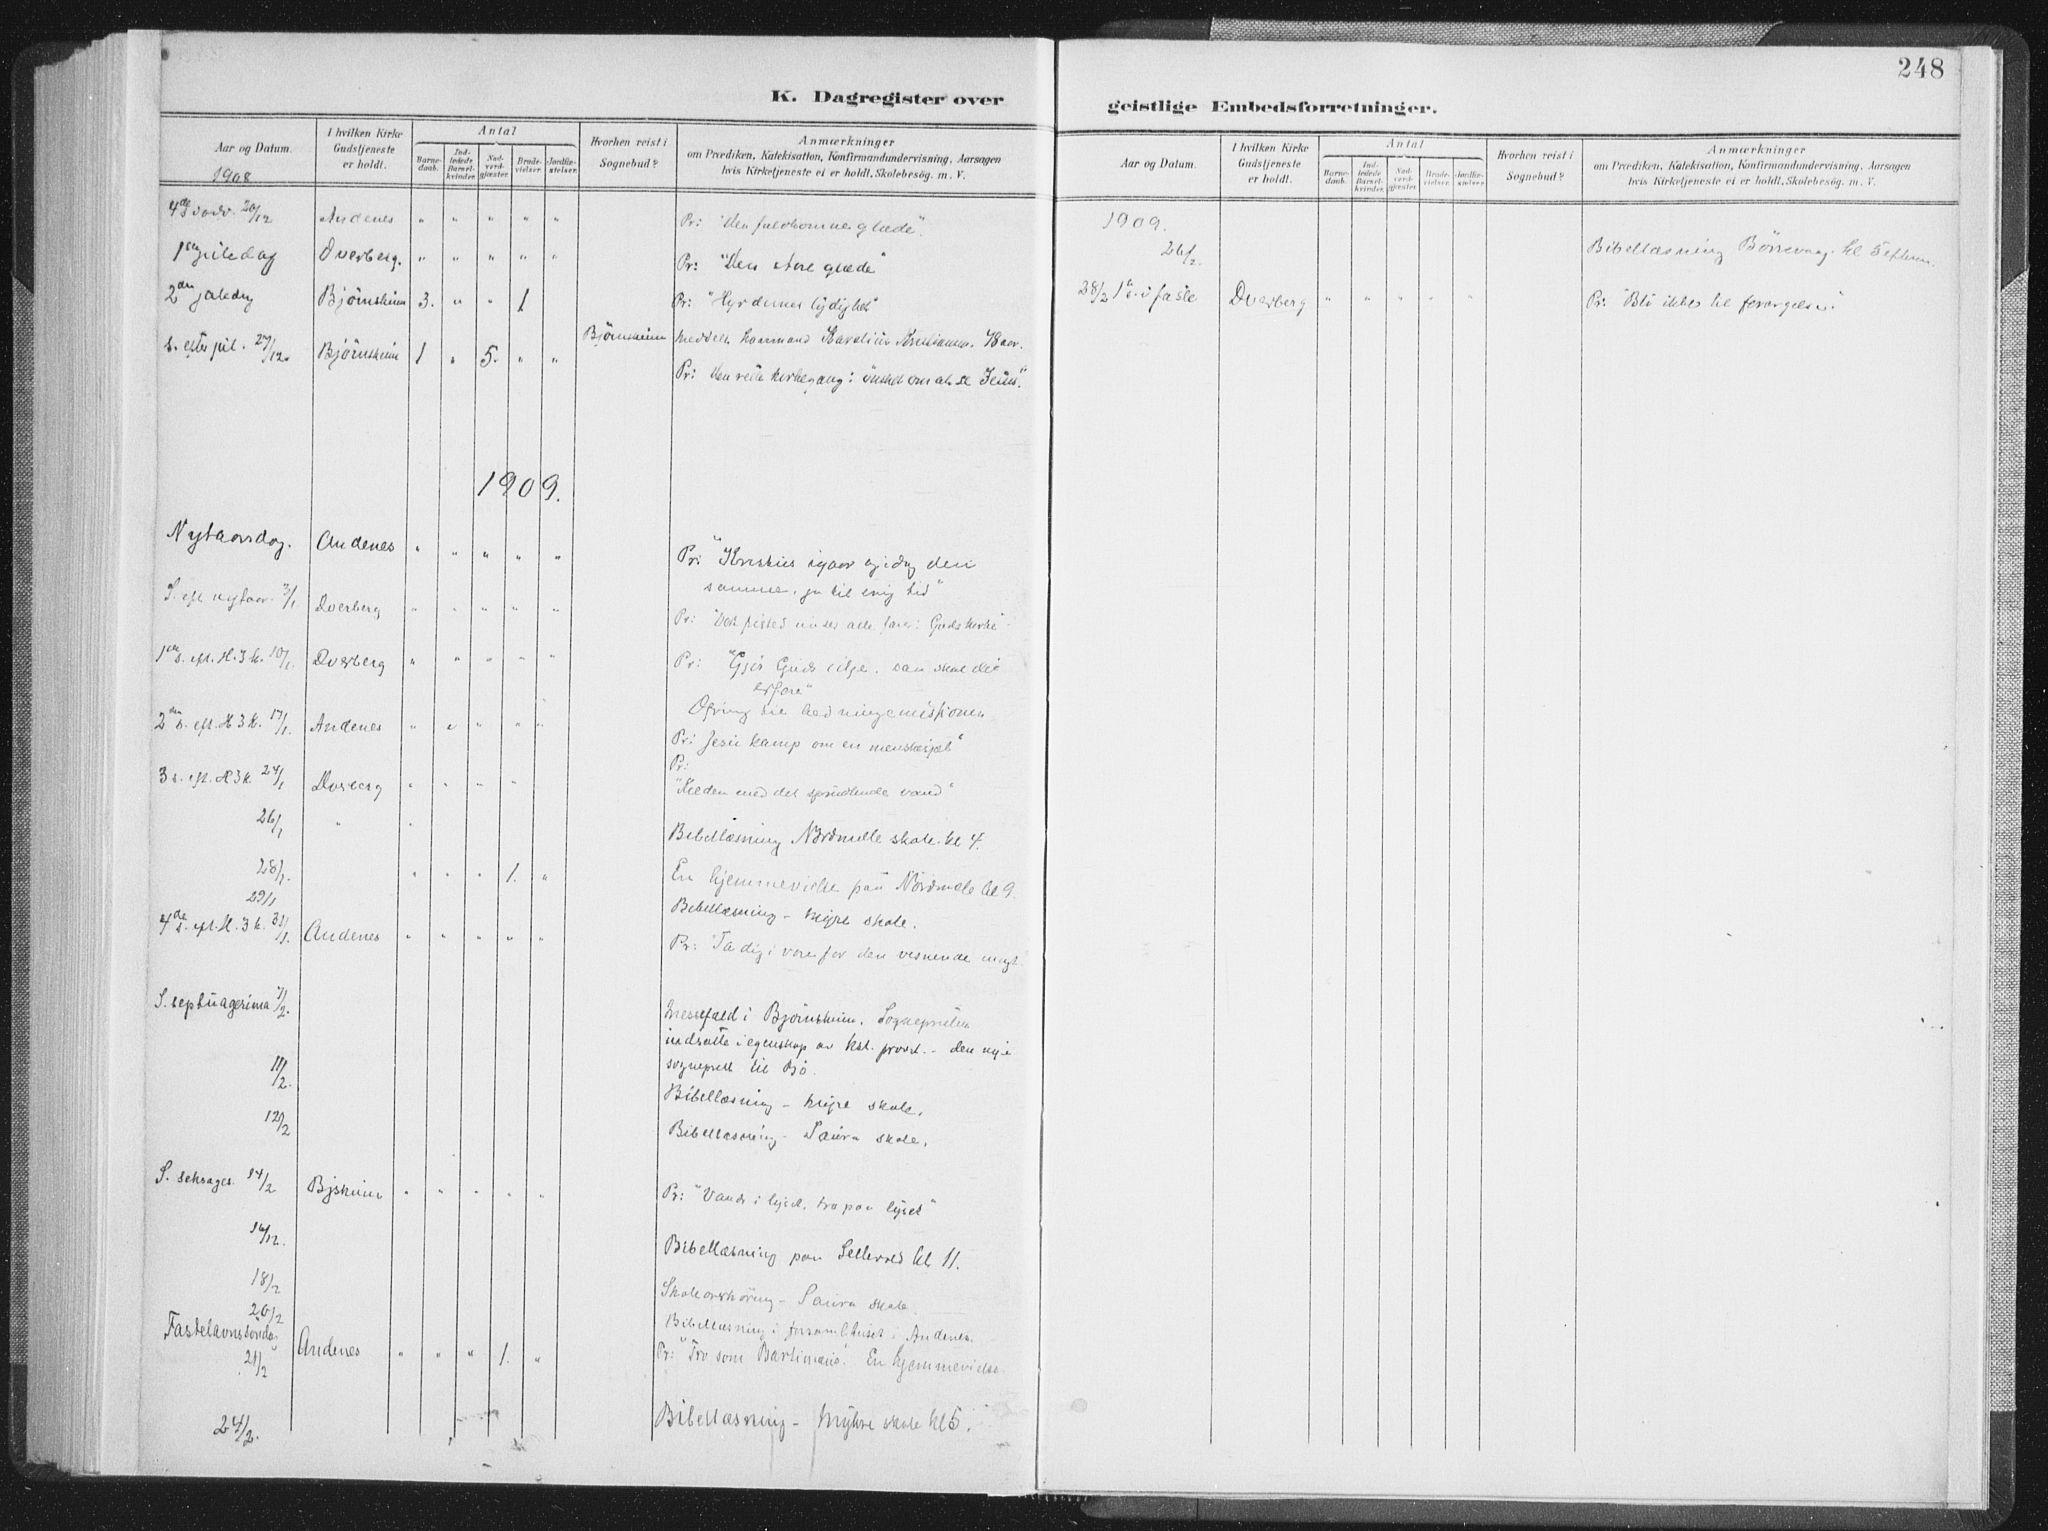 SAT, Ministerialprotokoller, klokkerbøker og fødselsregistre - Nordland, 897/L1400: Ministerialbok nr. 897A07, 1897-1908, s. 248